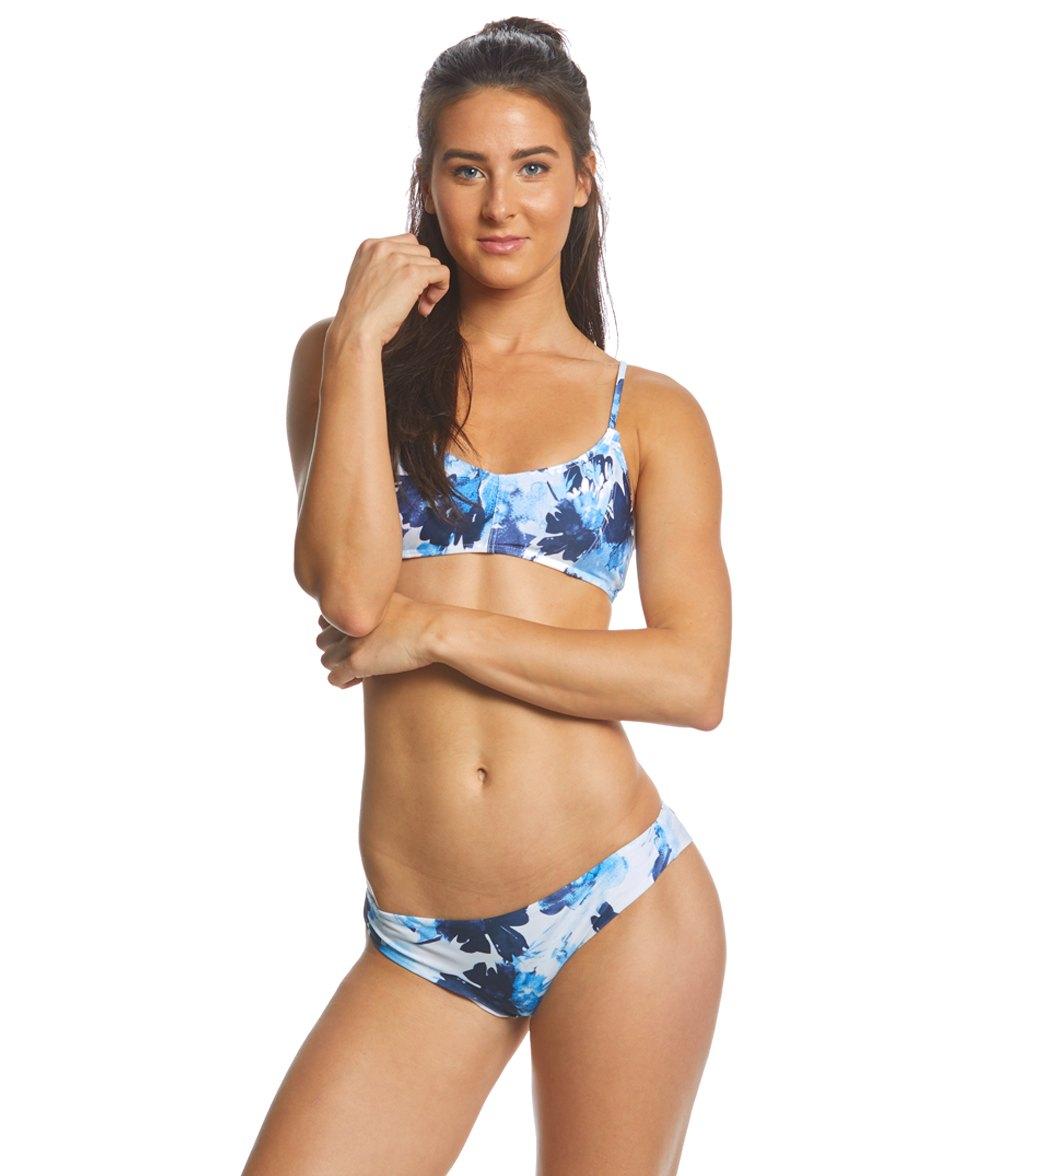 d3150eb6f9d1a RVCA Women s Paint Flower Bralette Bikini Top at SwimOutlet.com